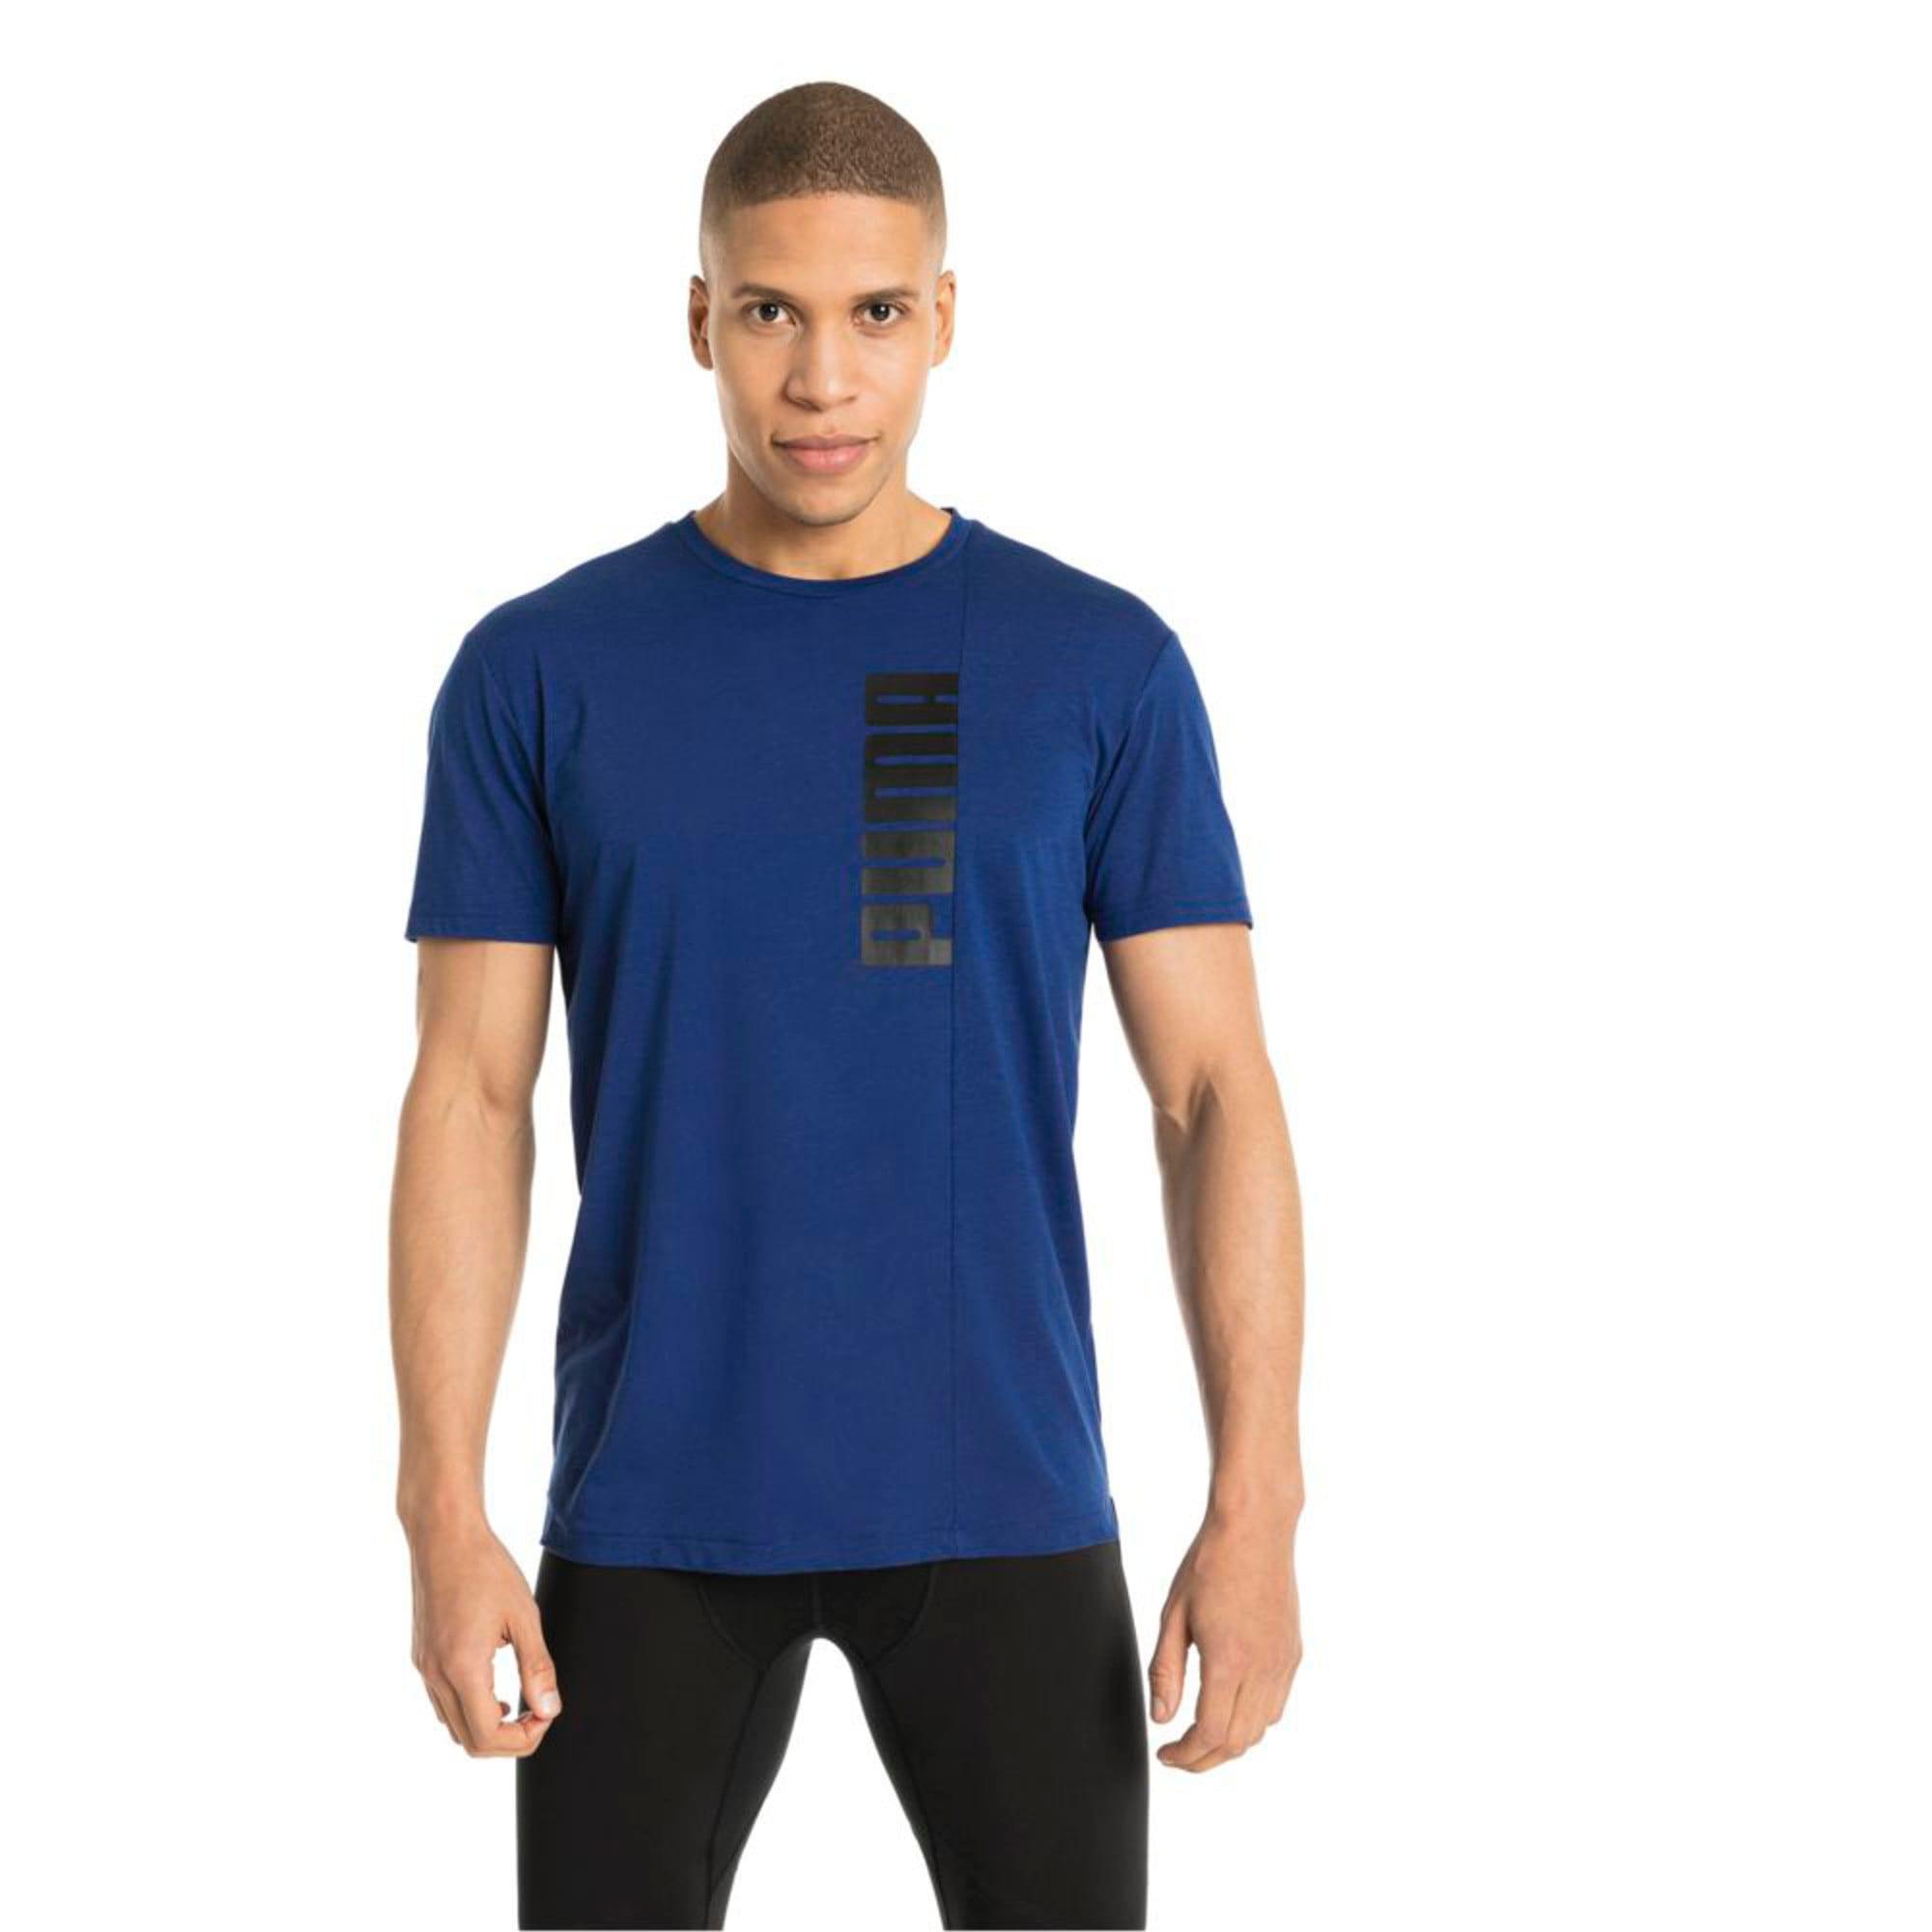 Thumbnail 3 of Energy Triblend Graphic Men's Running Tee, Sodalite Blue, medium-IND